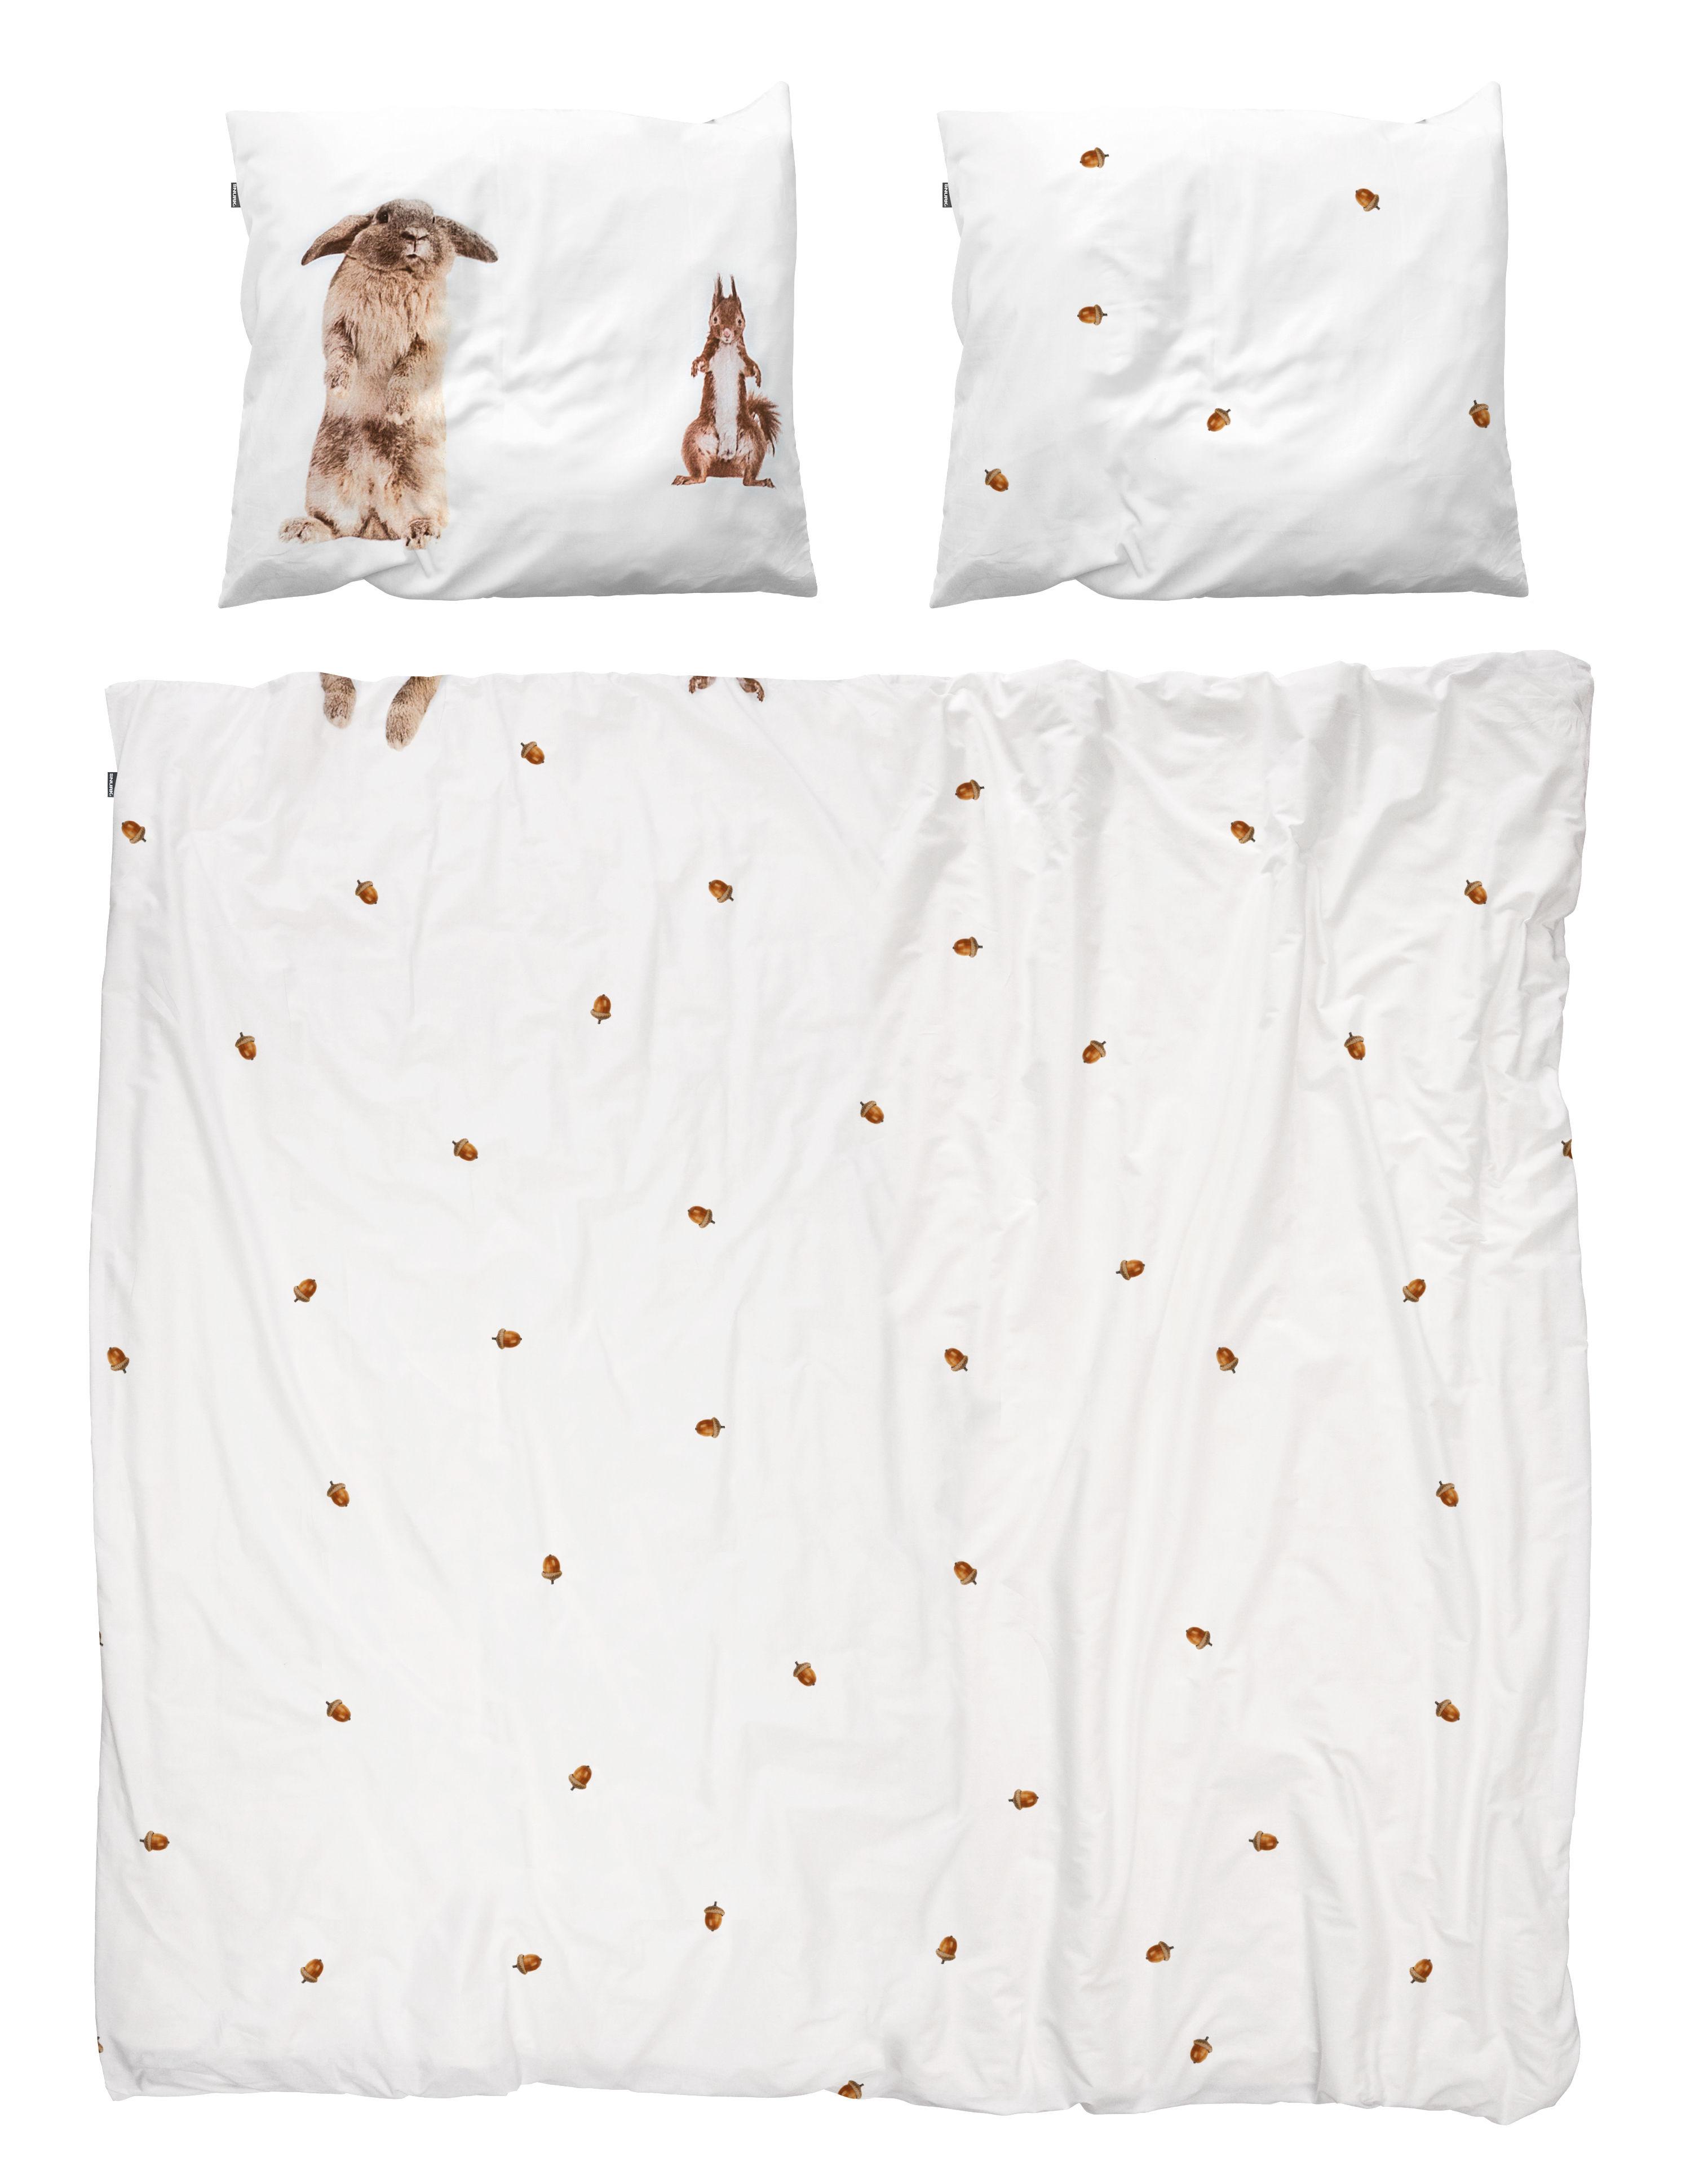 Decoration - Bedding & Bath Towels - Furry friends Bedlinen set for 2 people - 2 people / W 235 x L 220 cm by Snurk - Furry friends - Cotton percale